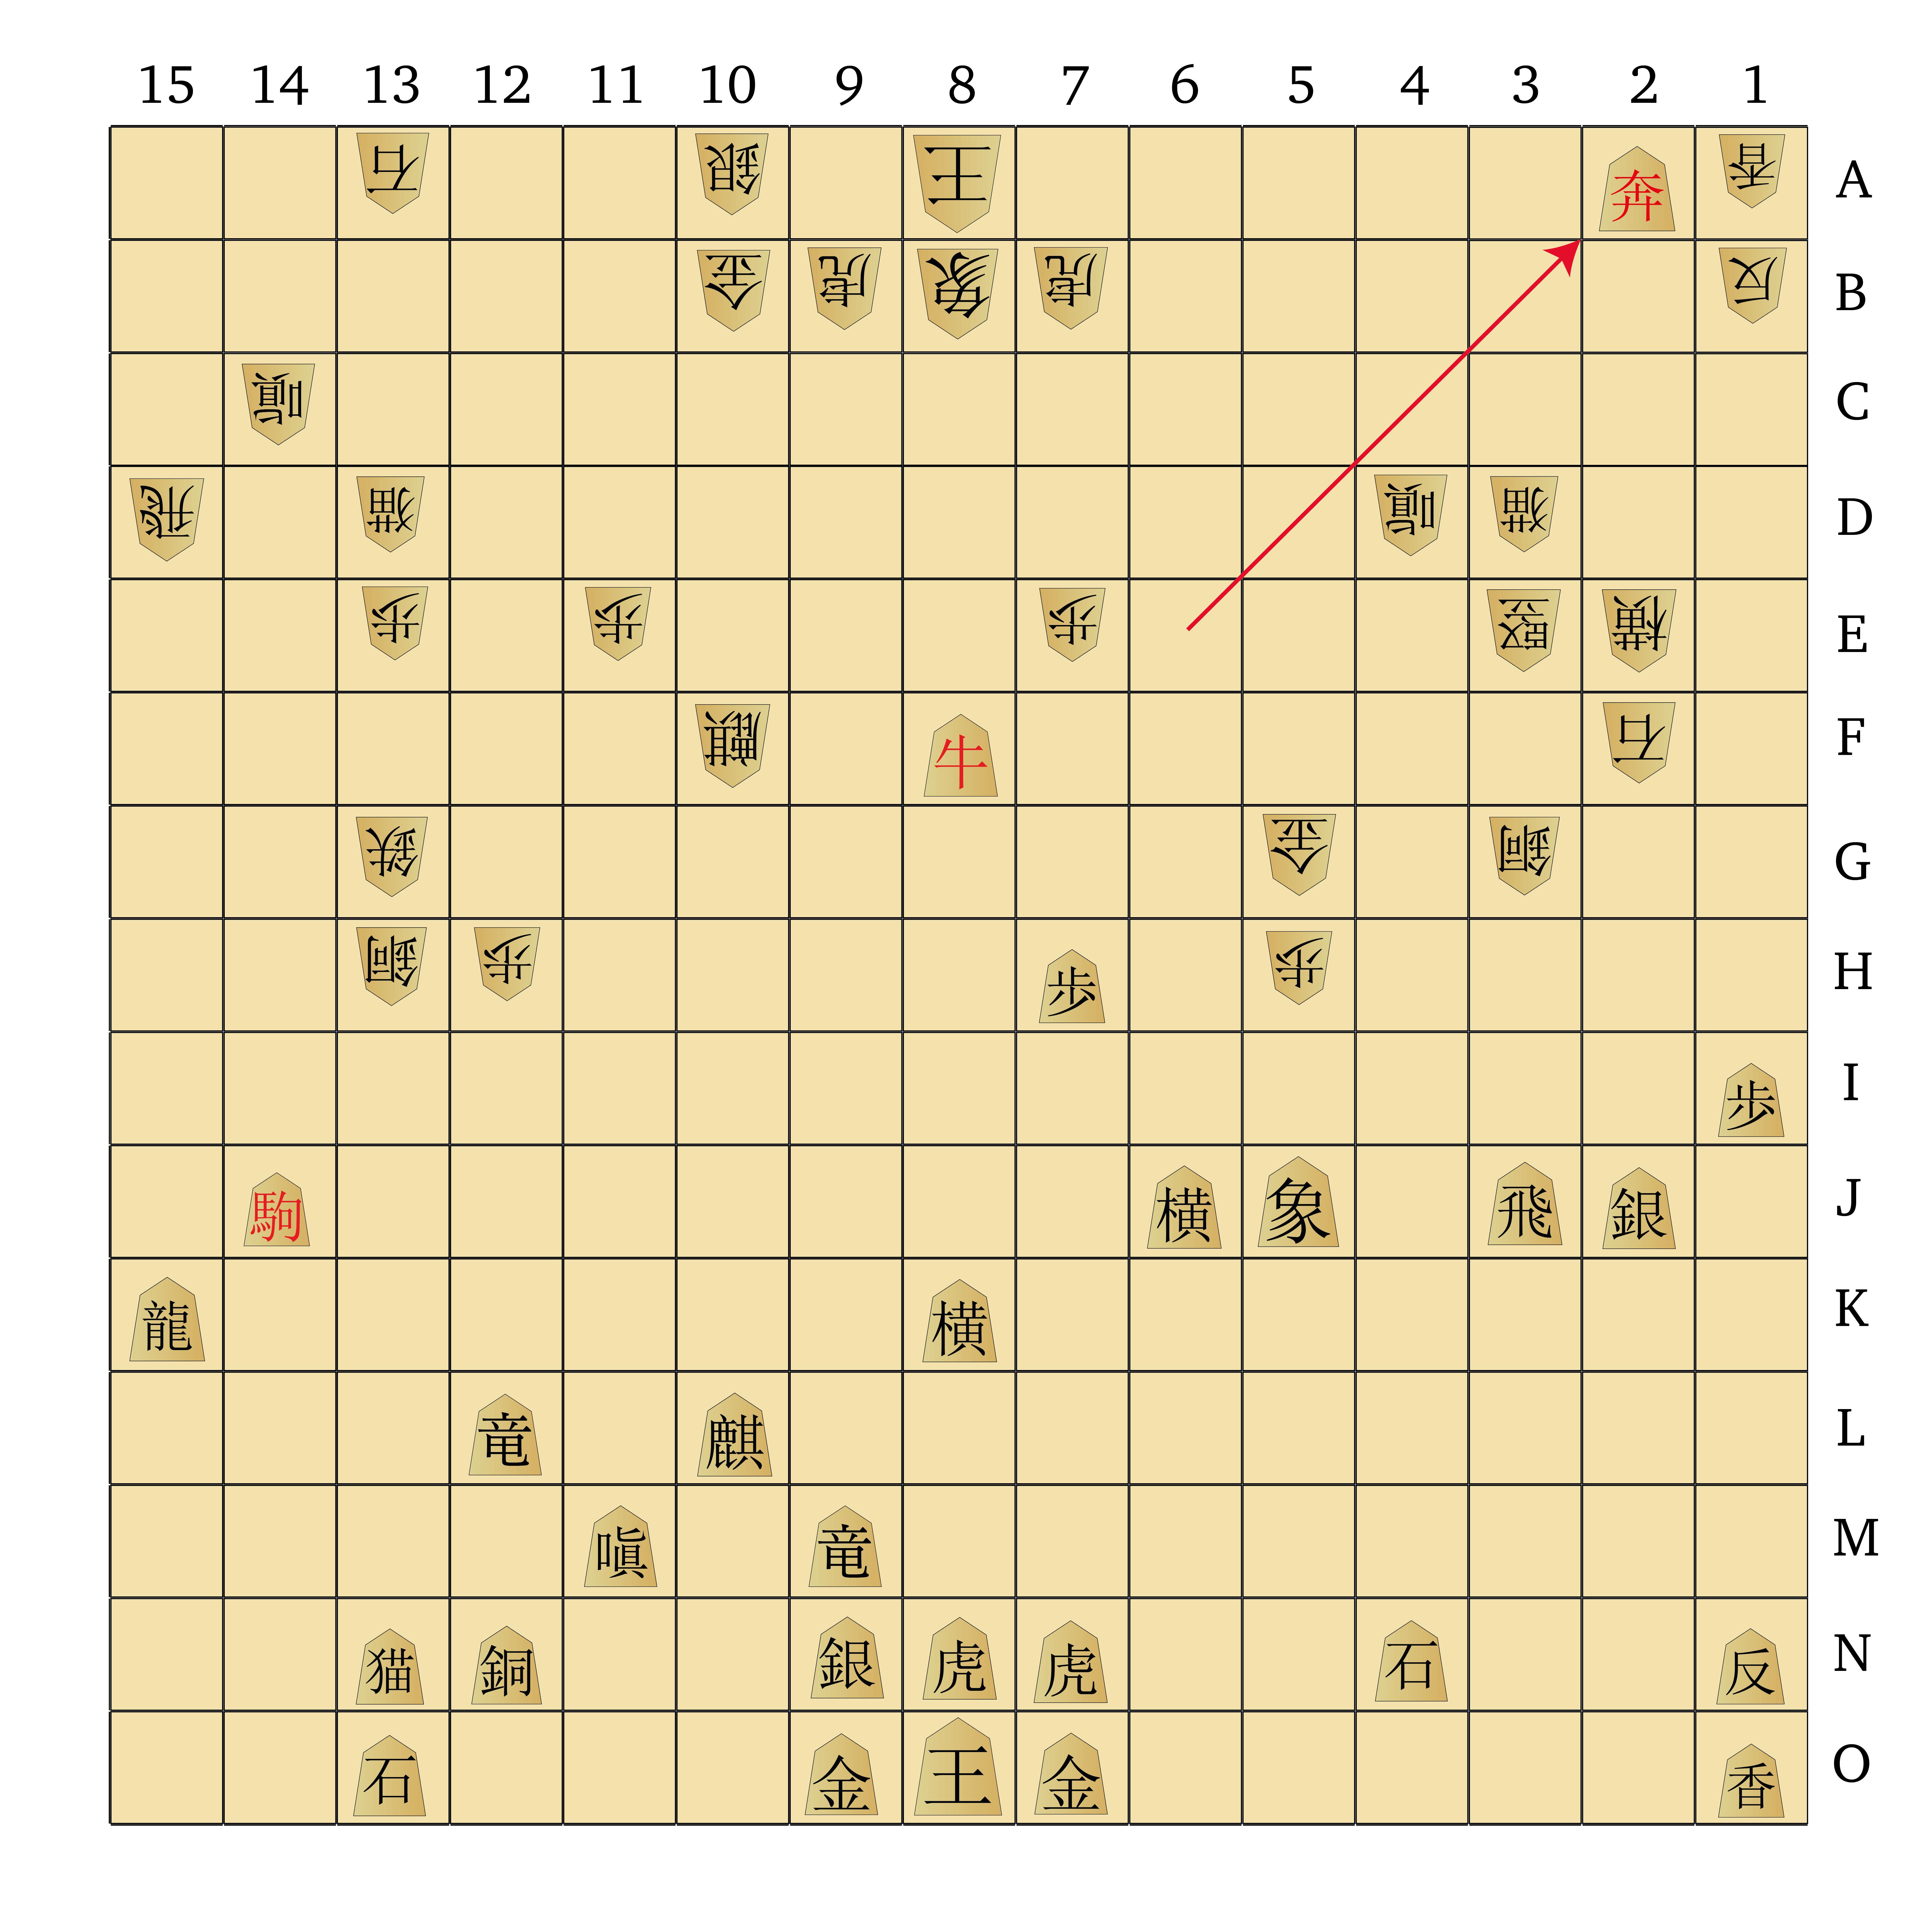 Dai Shogi 420 -- Move 433-01